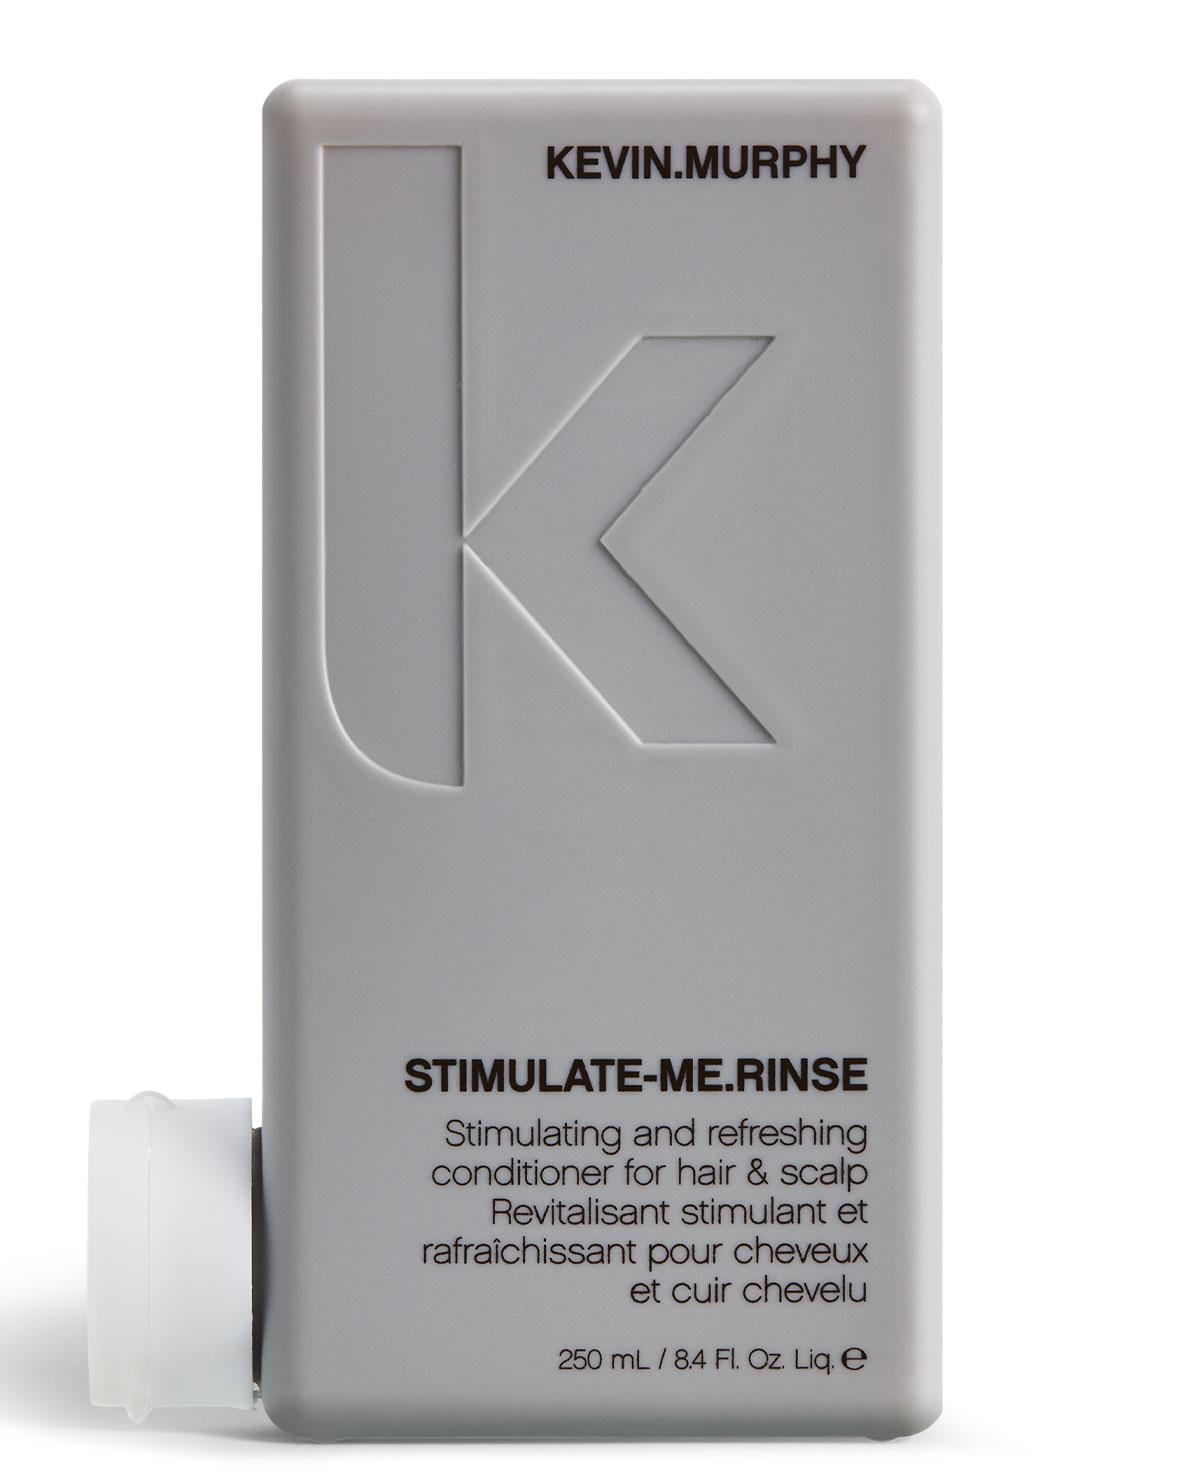 Kevin.Murphy STIMULATE-ME.RINSE 250ml